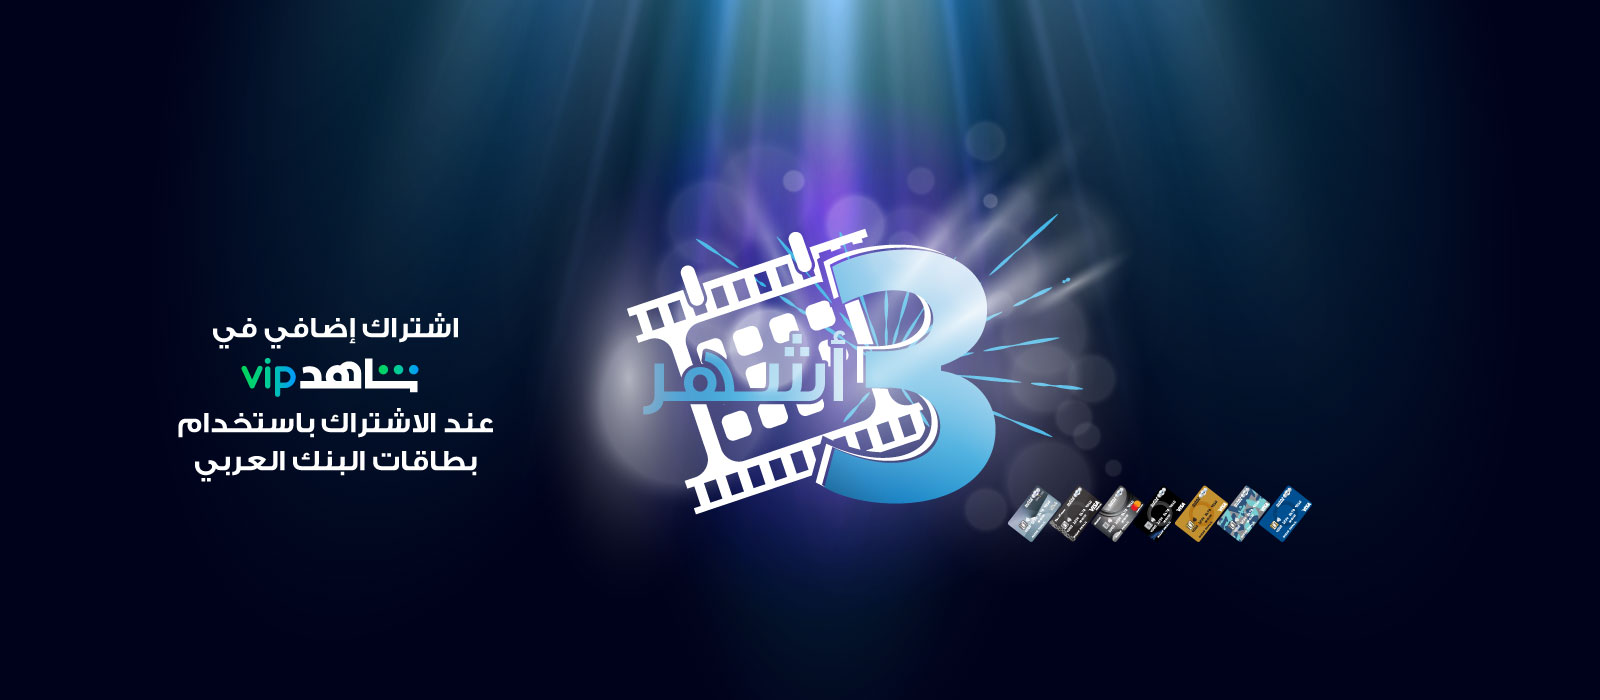 AB-MBC-Shahid-Website-banner-Palestine-AR